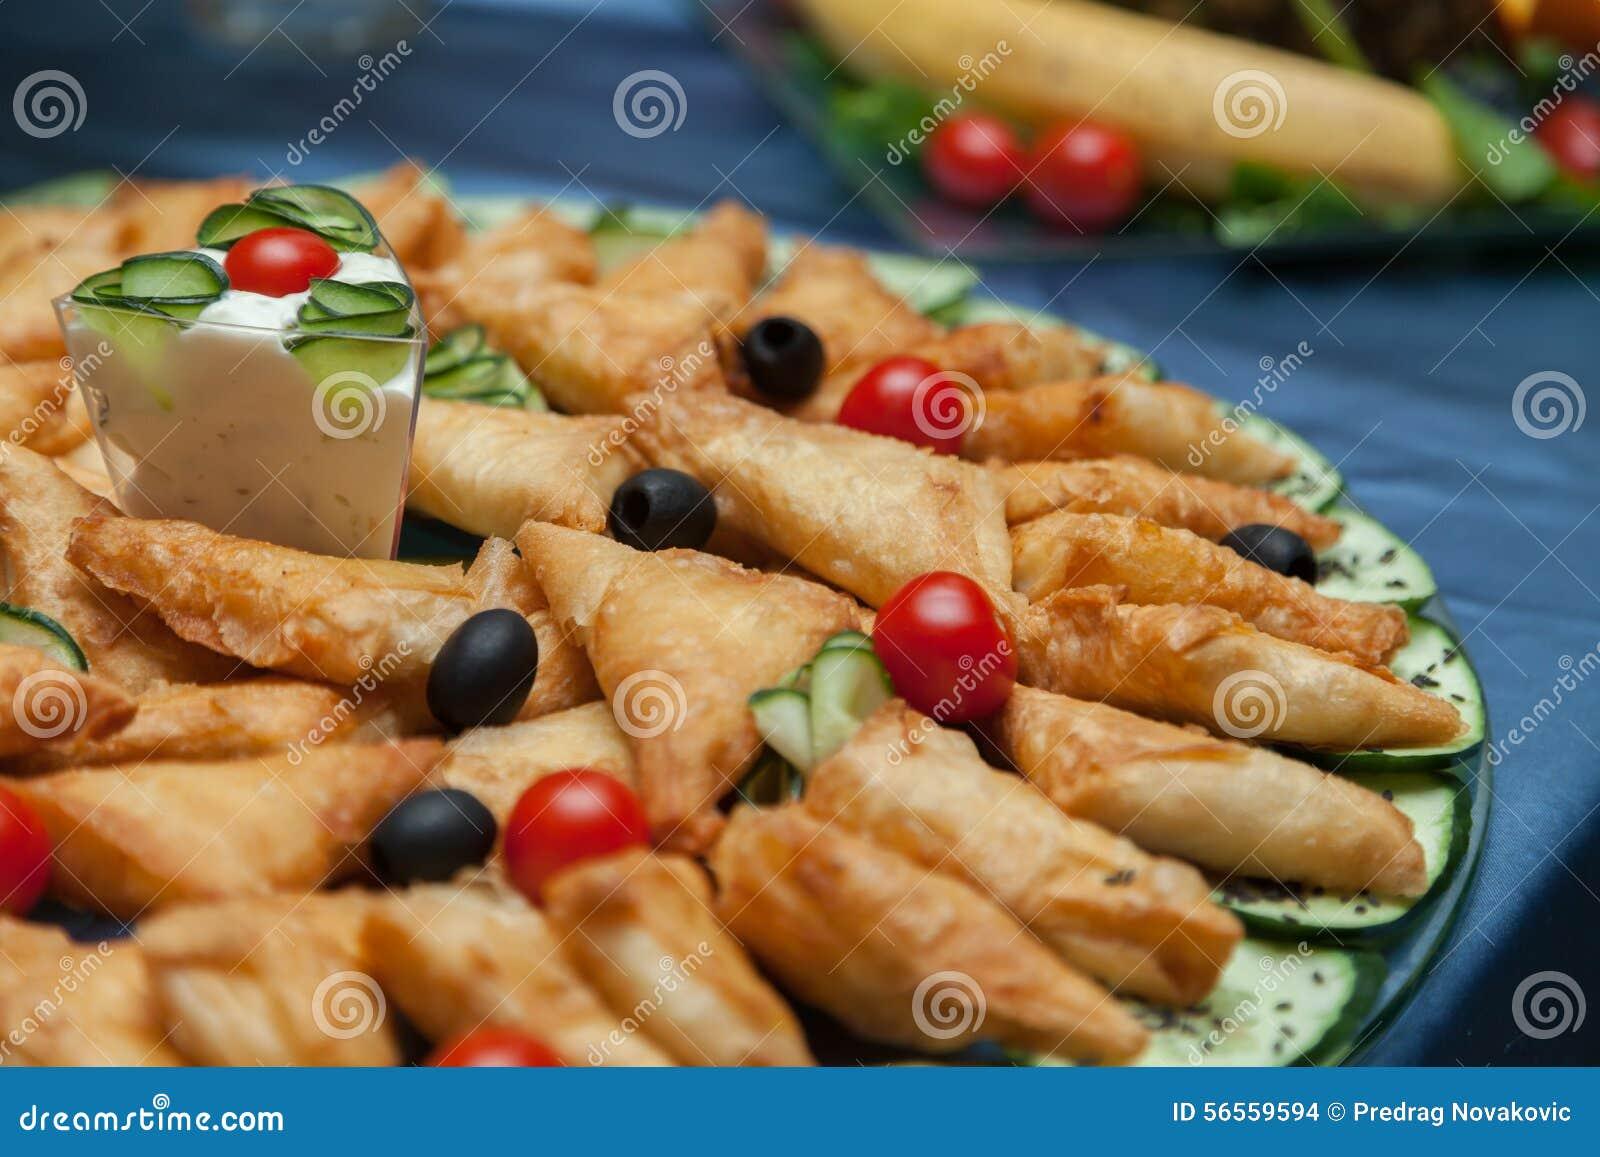 Download εύγευστα τρόφιμα στοκ εικόνες. εικόνα από εστίαση, διακοπές - 56559594